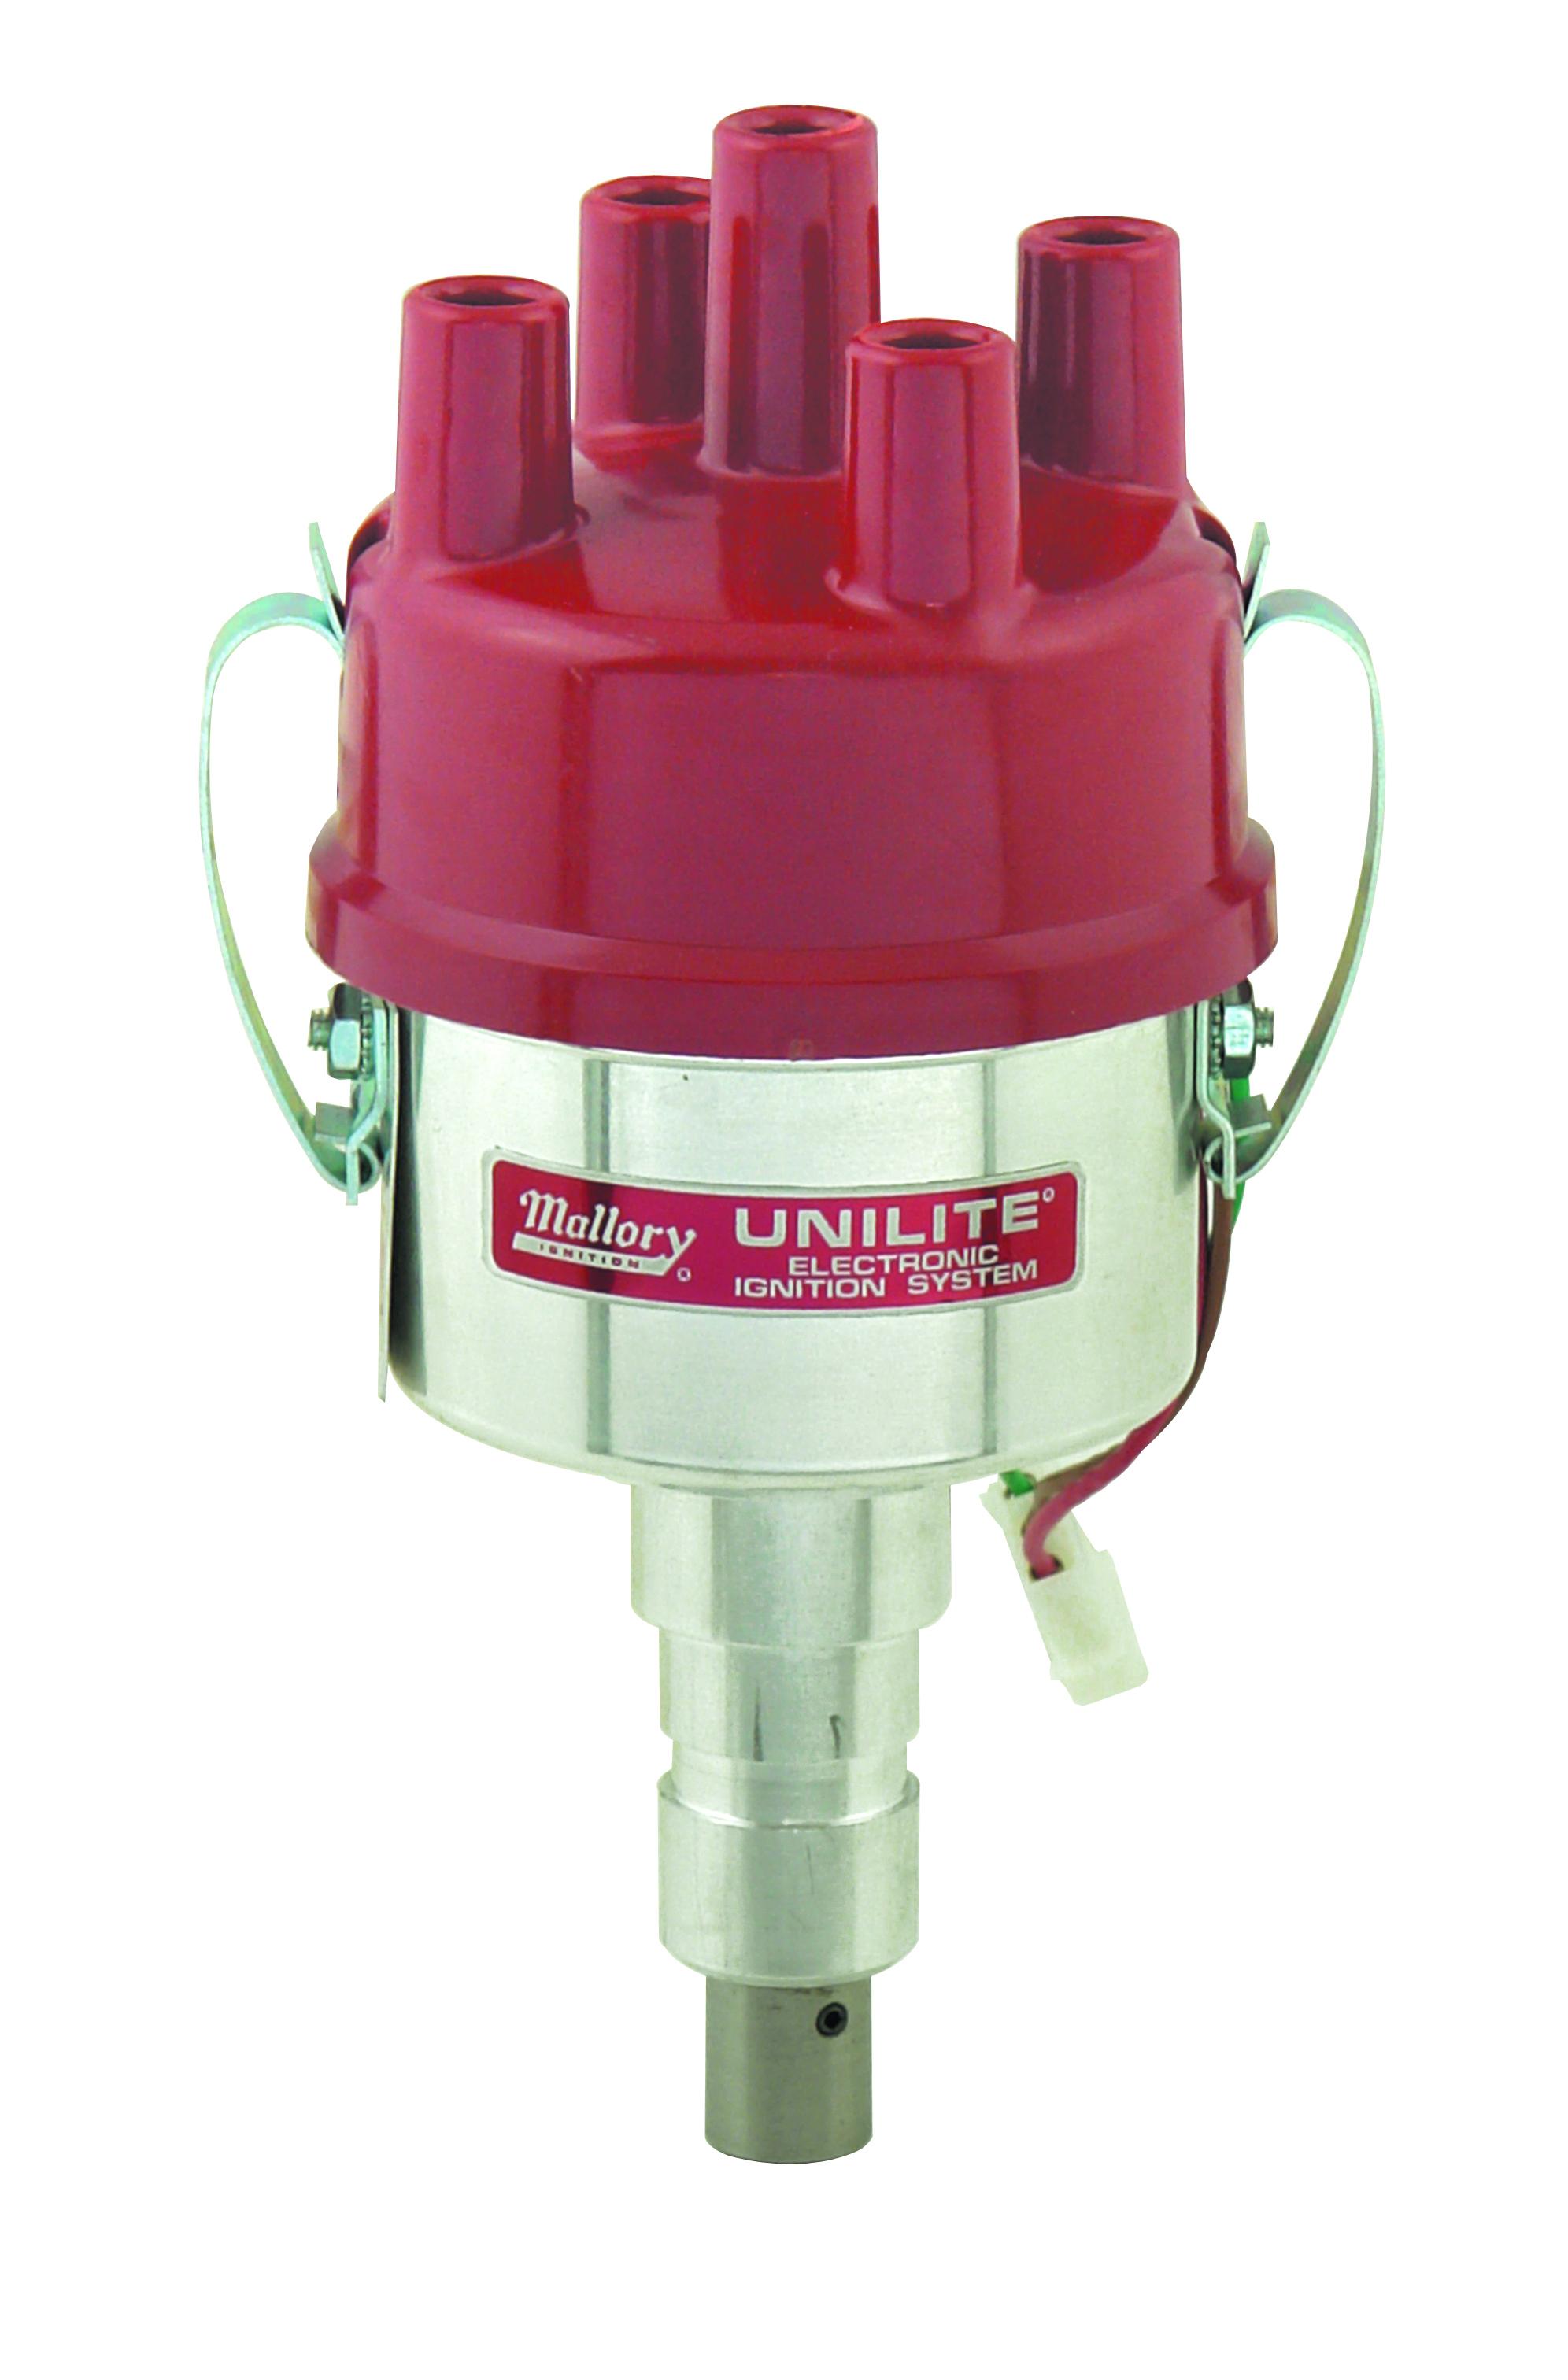 mallory unilite distributor wiring diagram kc fog light ignition 4501106 electronic